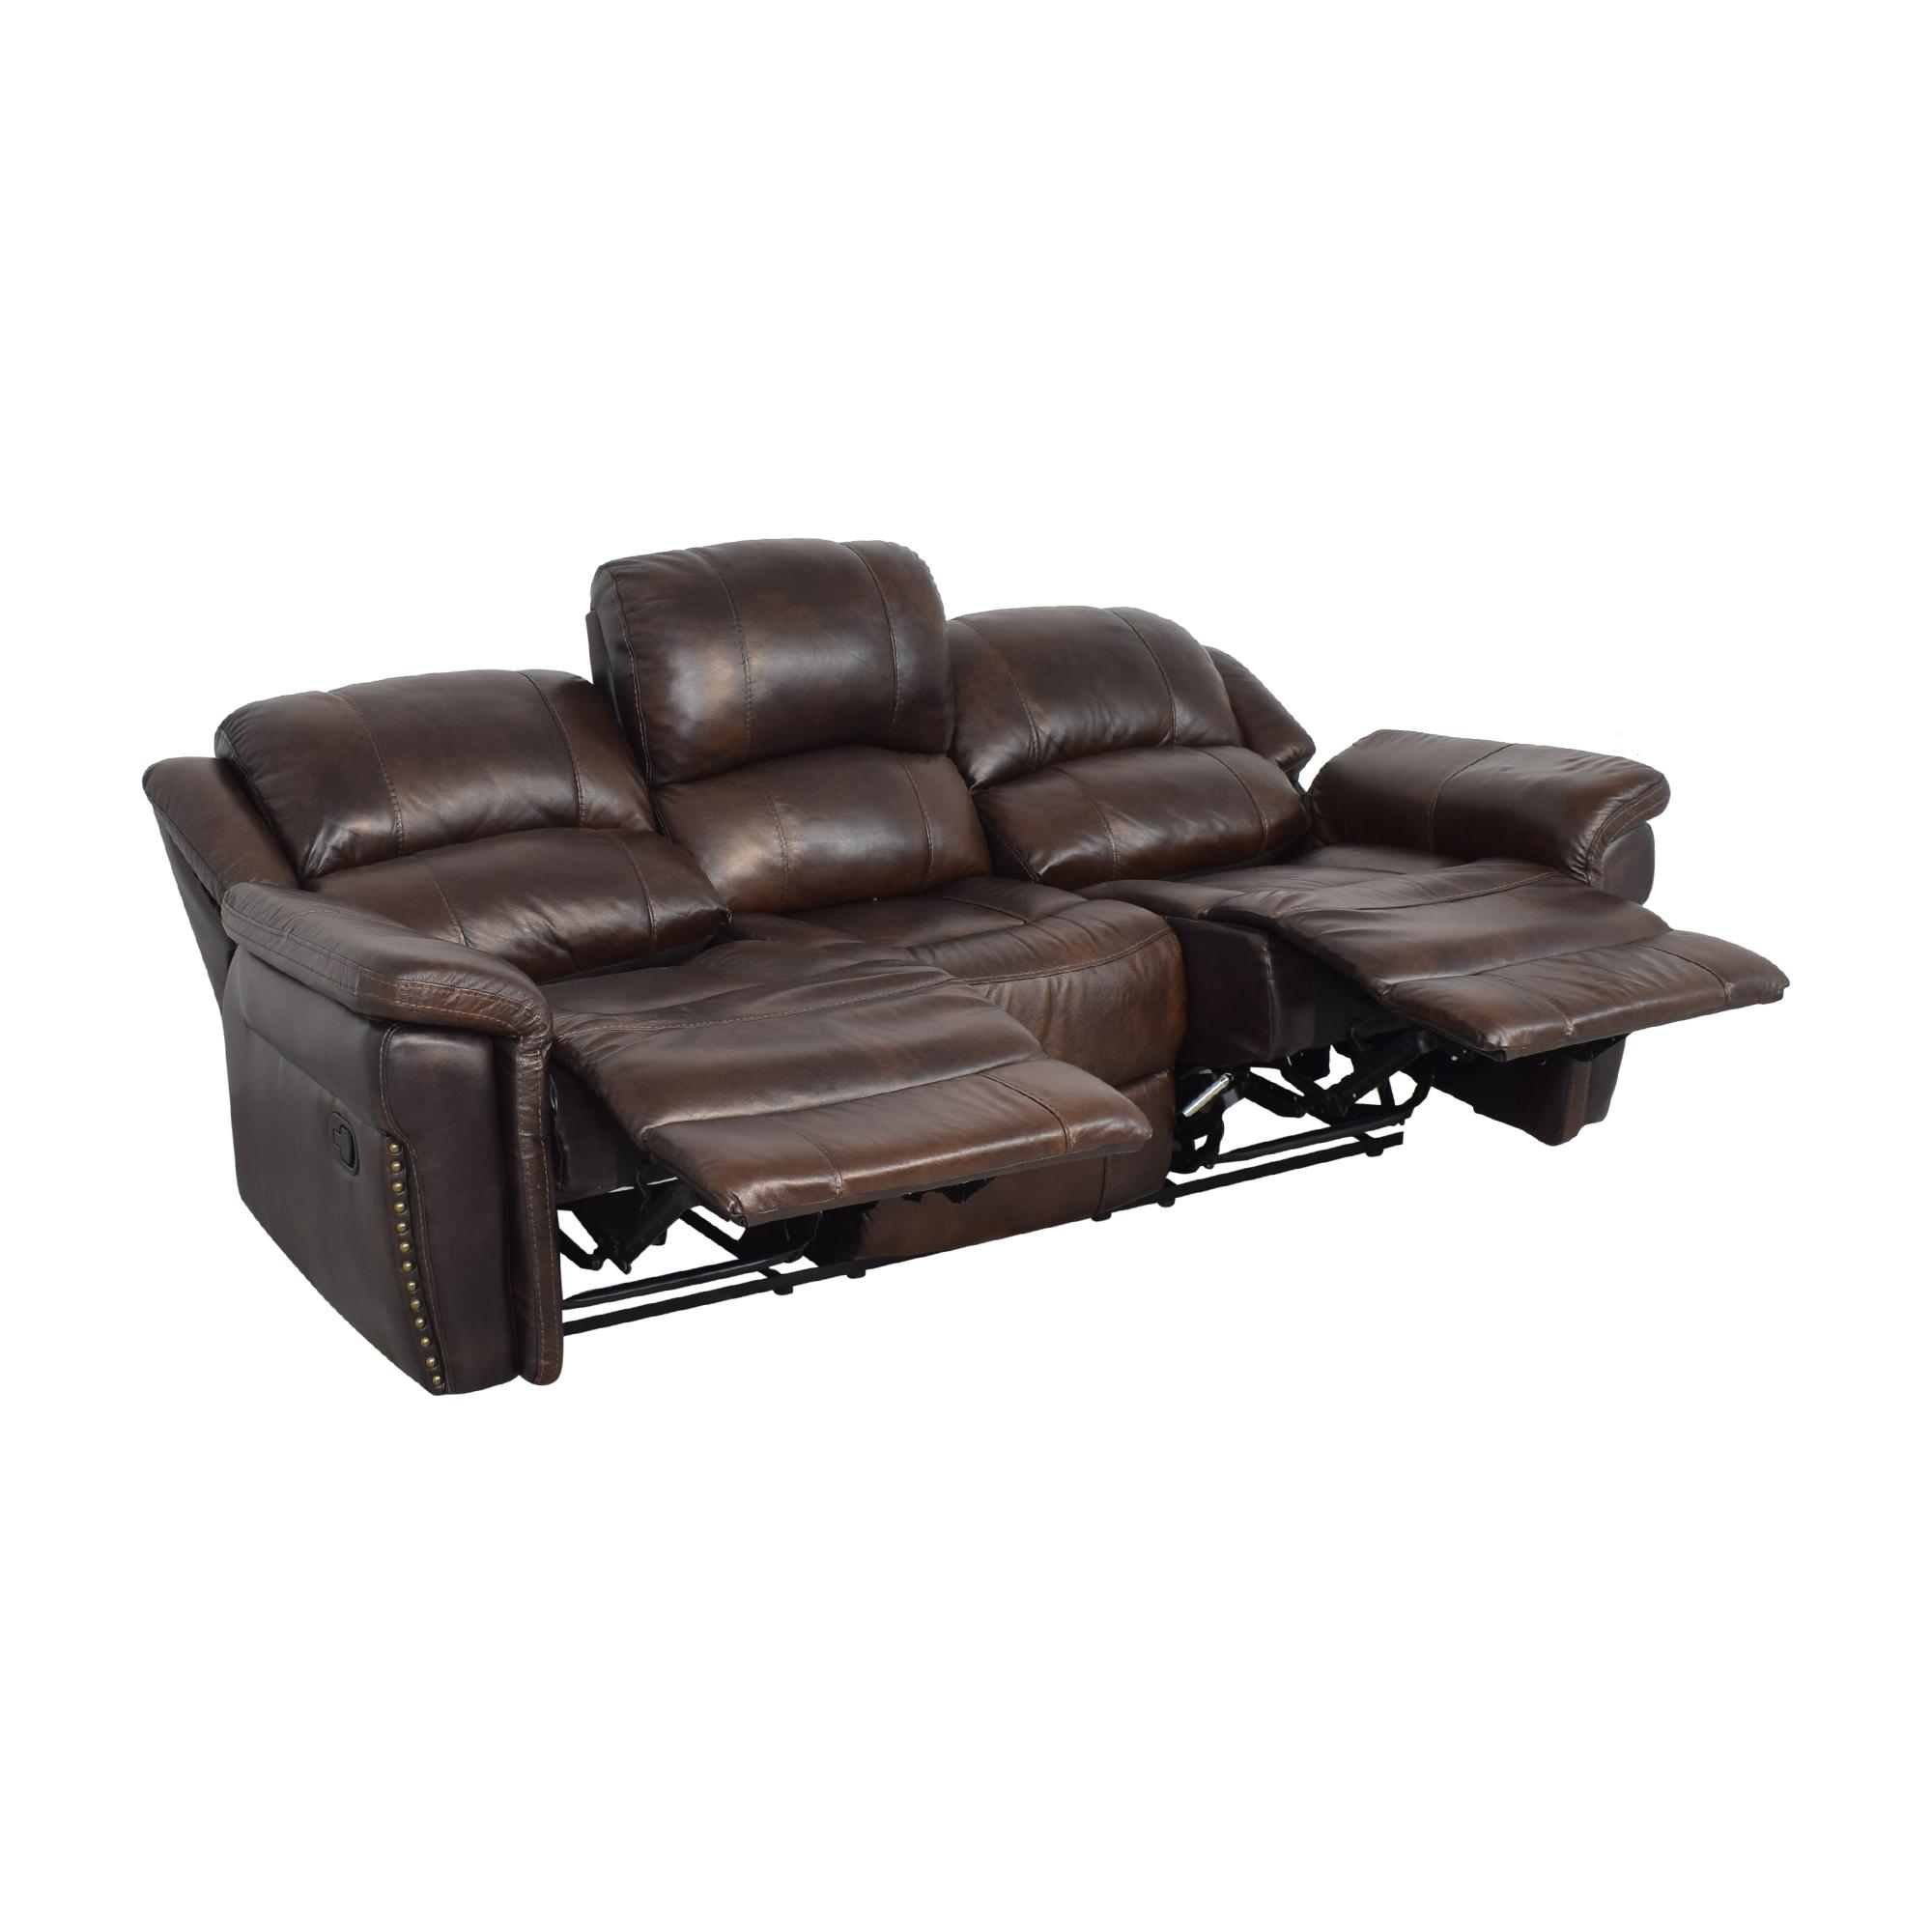 Delancey Street Furniture Recliner Sofa pa